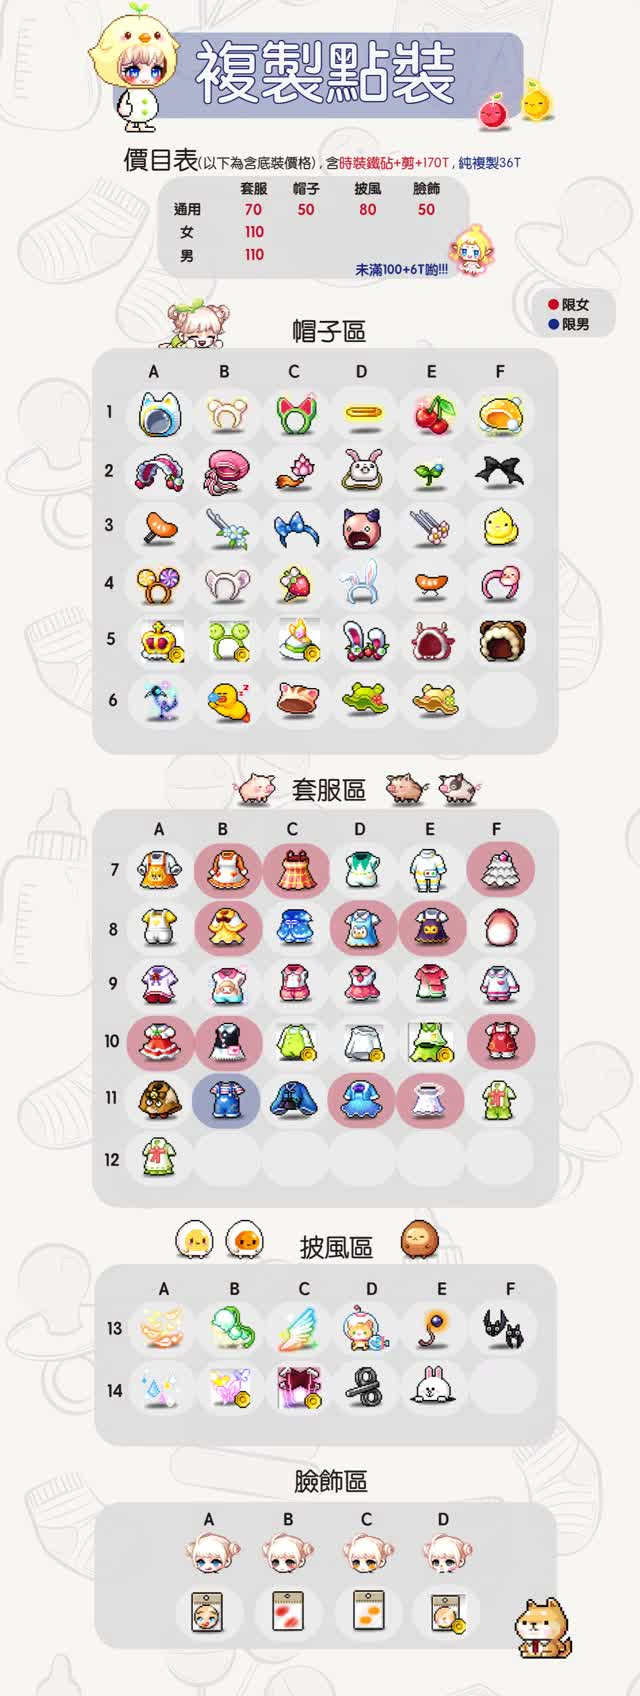 Watch and share 0419動畫 GIFs on Gfycat